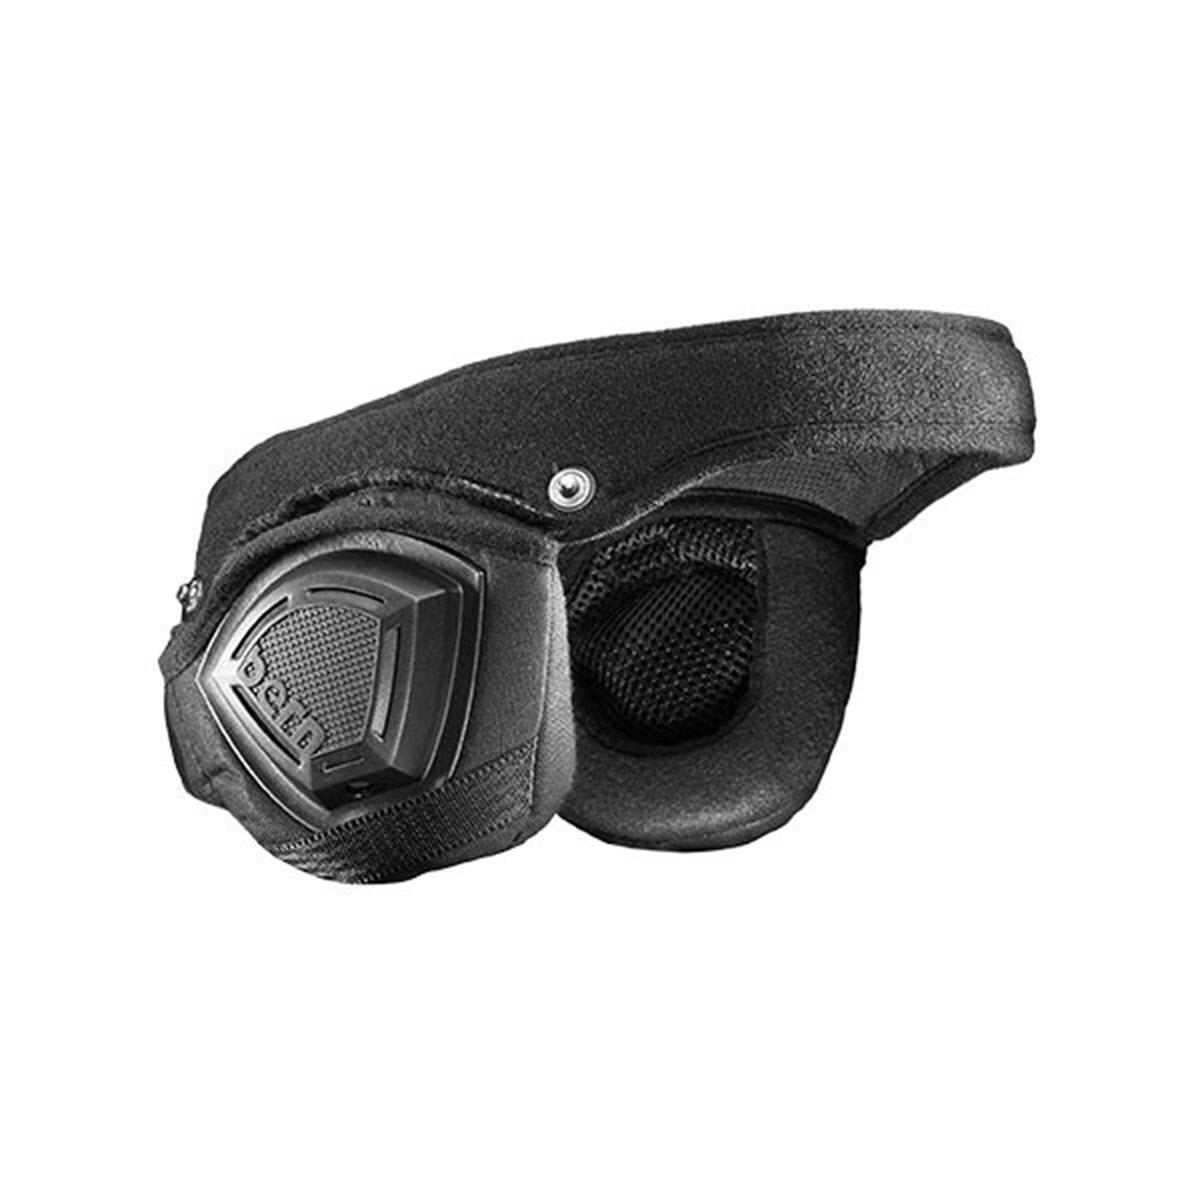 645ec2421a72 Sentinel Bern Helmet Winter Liner -Brentwood Helmets Only with Boa- Ski  Snowboard Liner